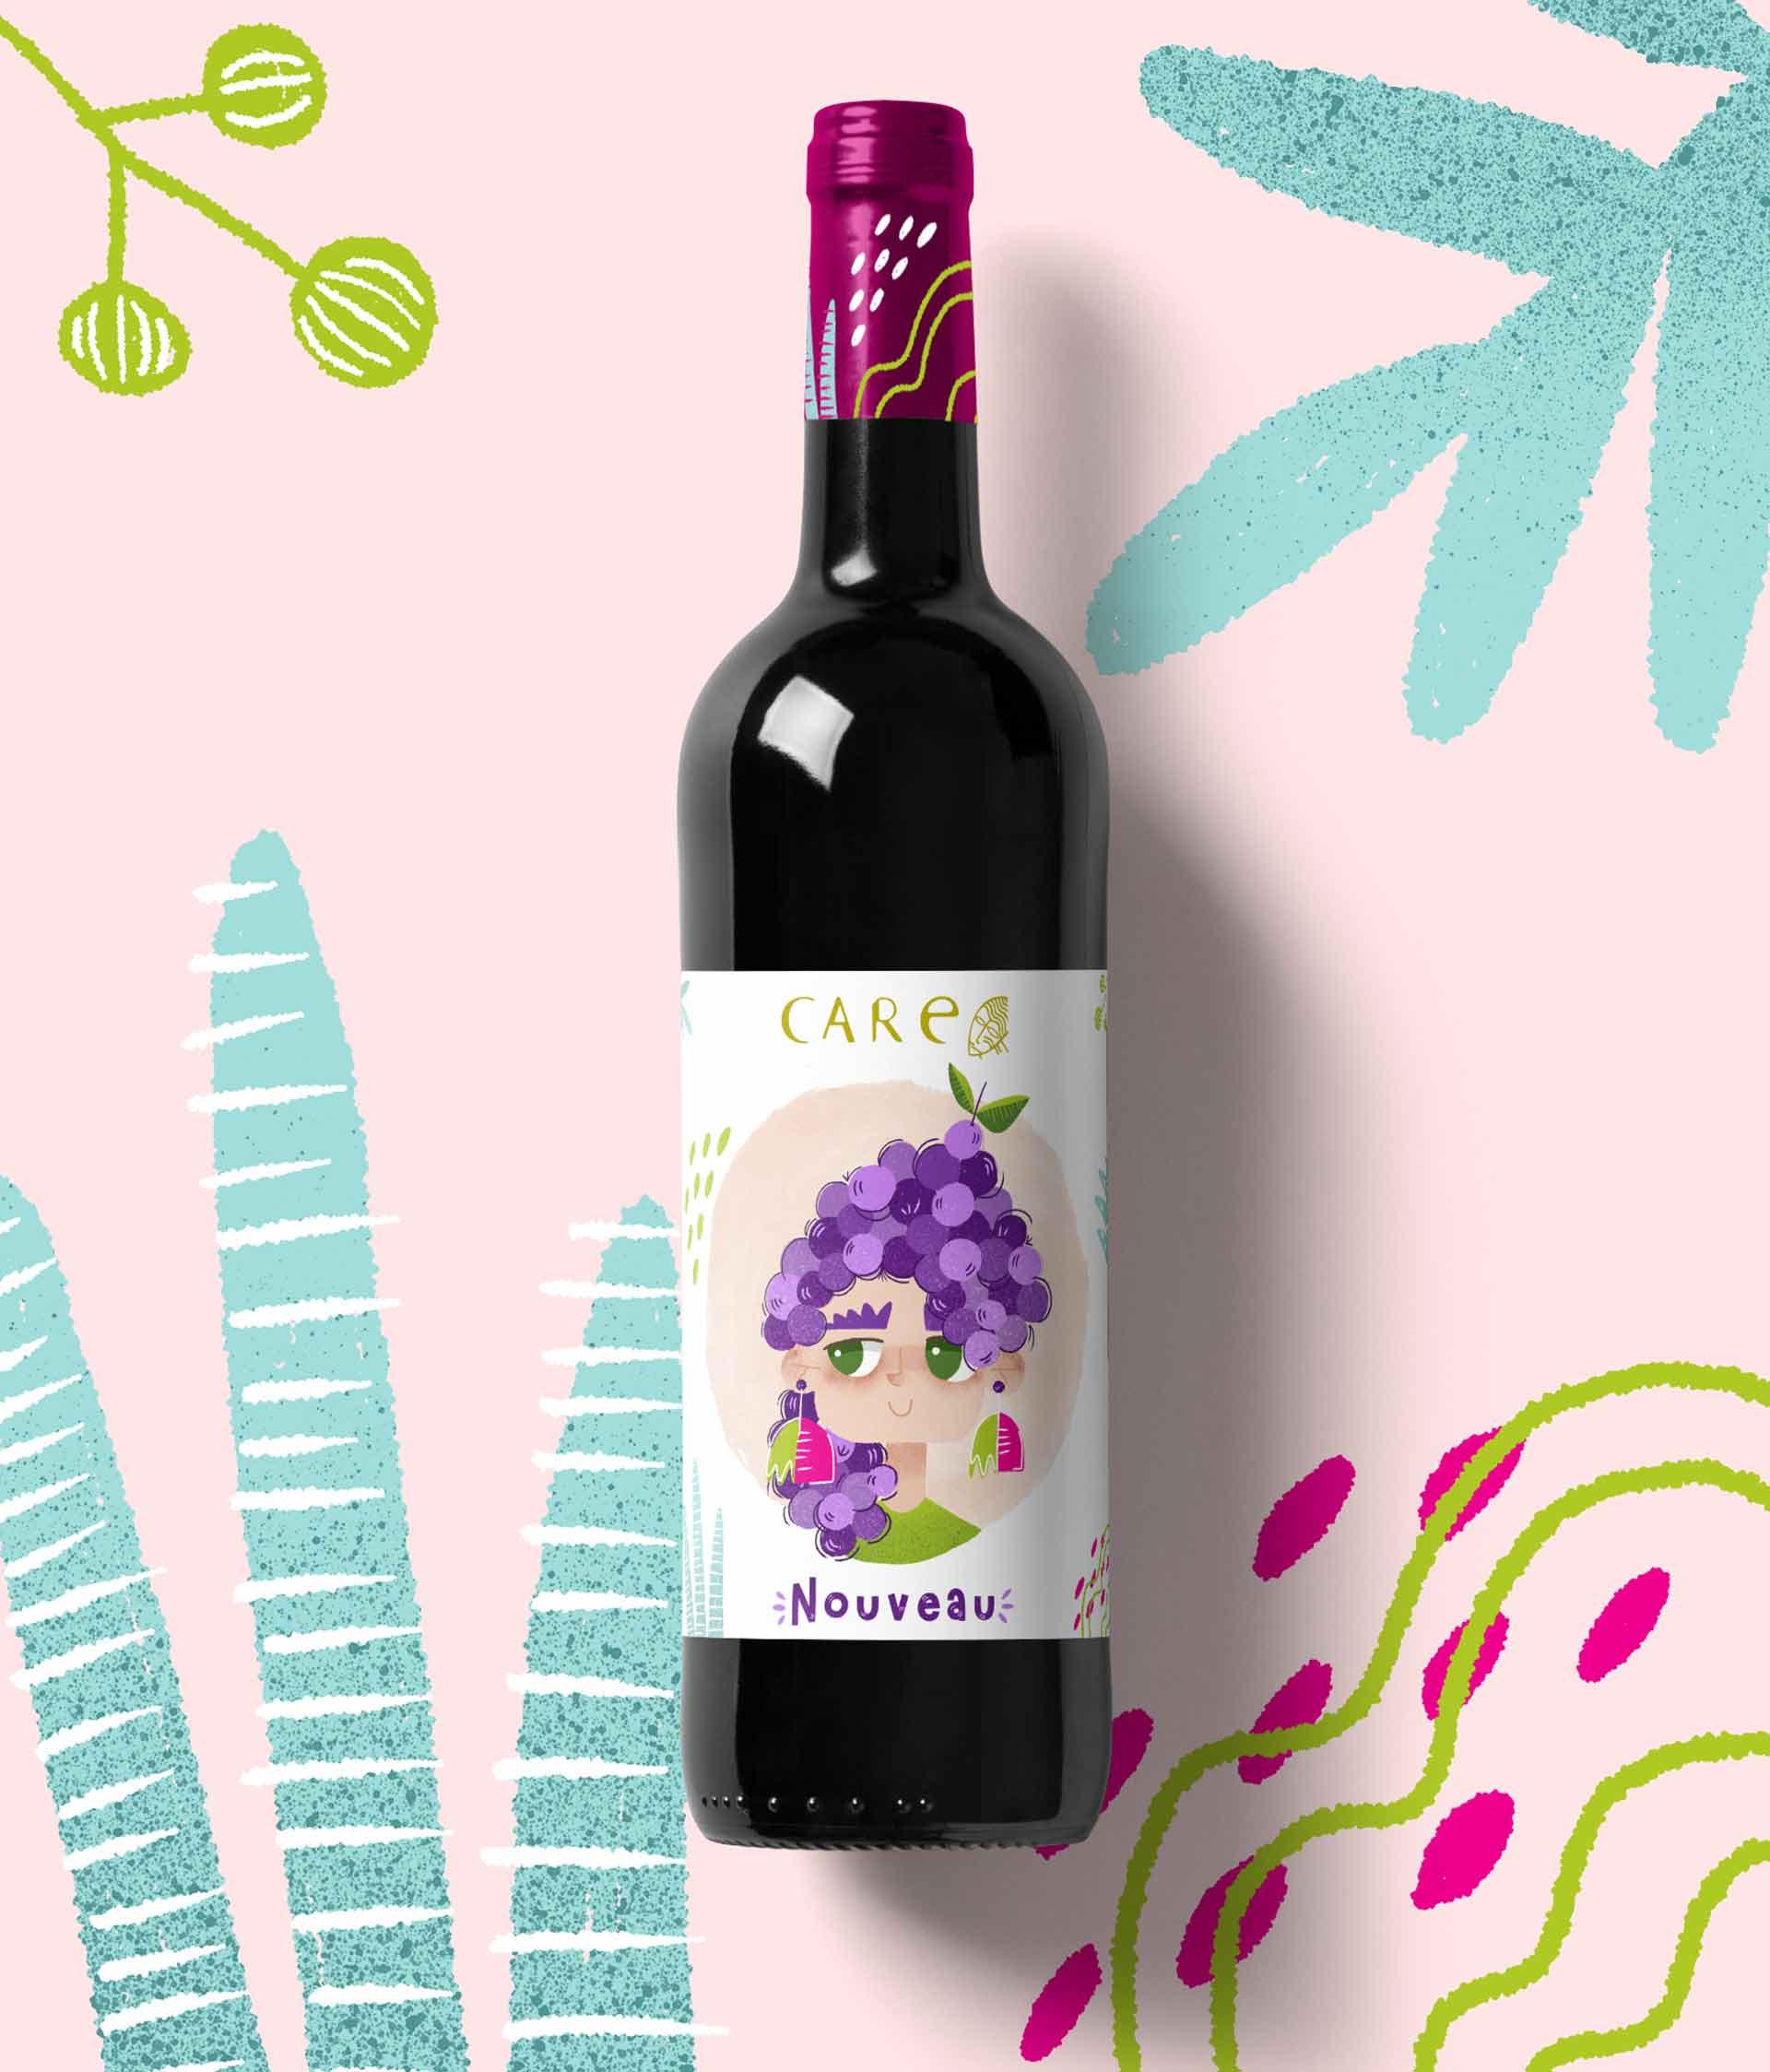 jess sanmiguel propuesta etiqueta de vino care wine-2